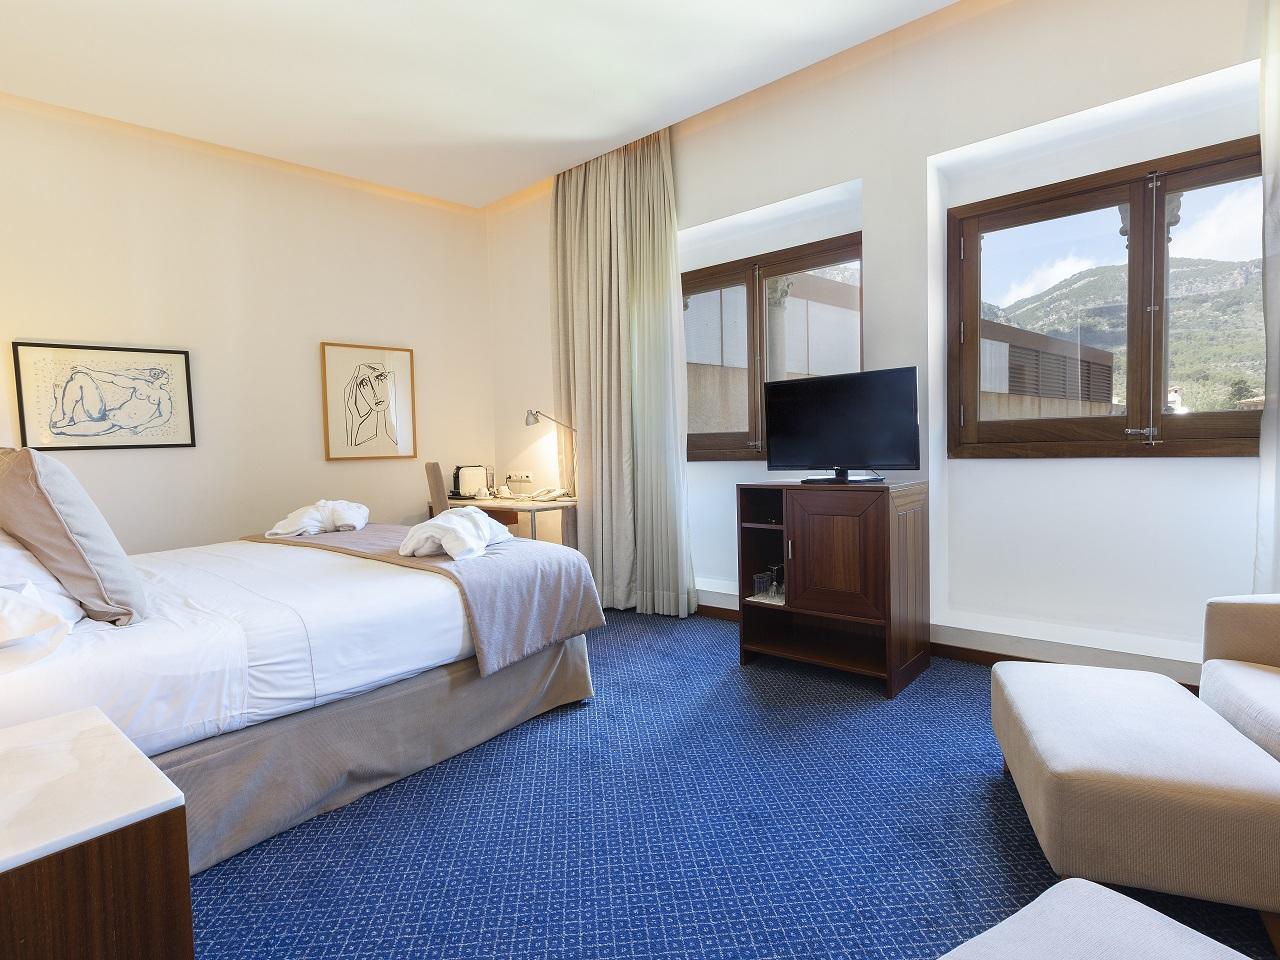 Suite at Gran Hotel Sóller in Sóller, Majorca